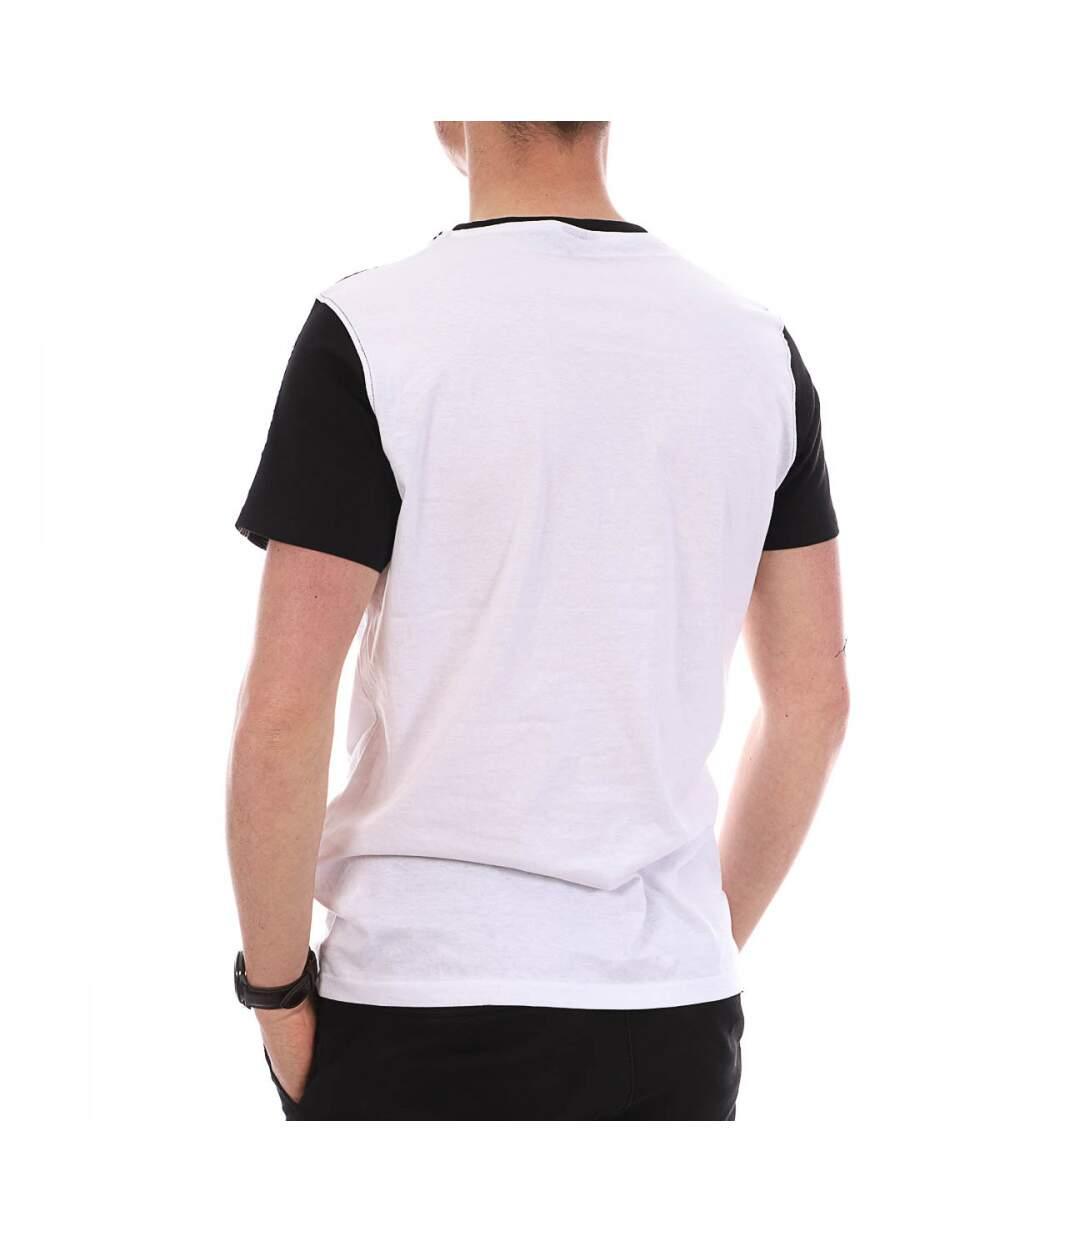 T-shirt Blanc, Noir, Bleu Homme Airness Keny